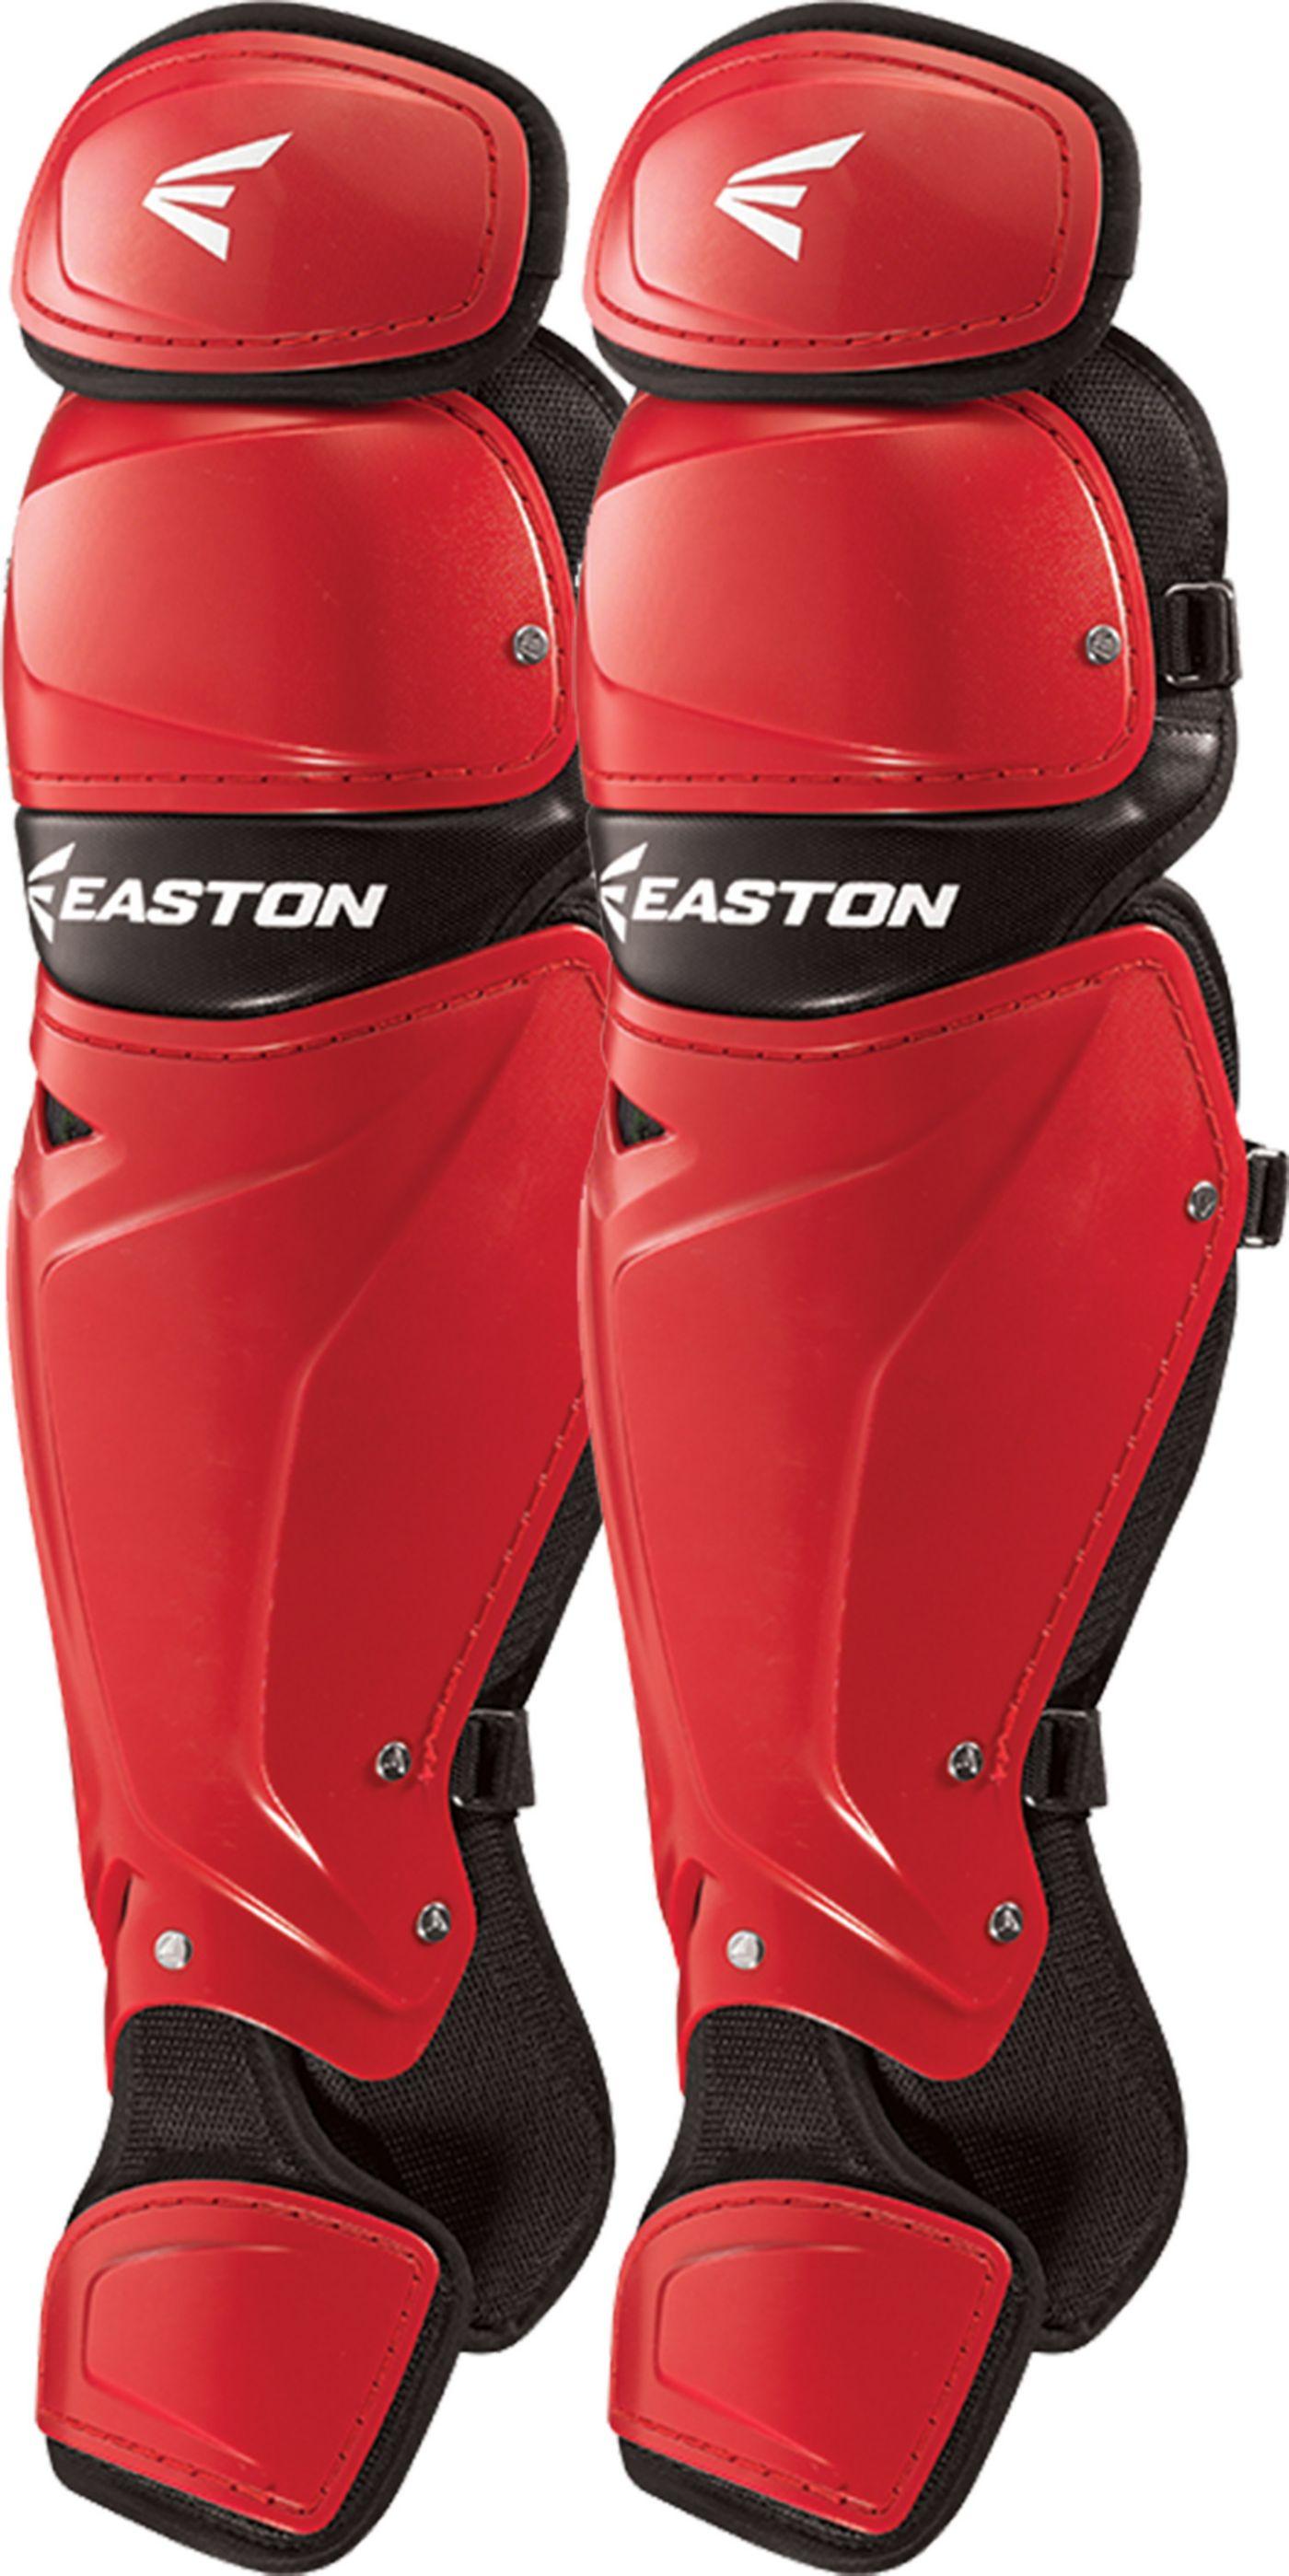 Easton Intermediate Mako Catcher's Leg Guards